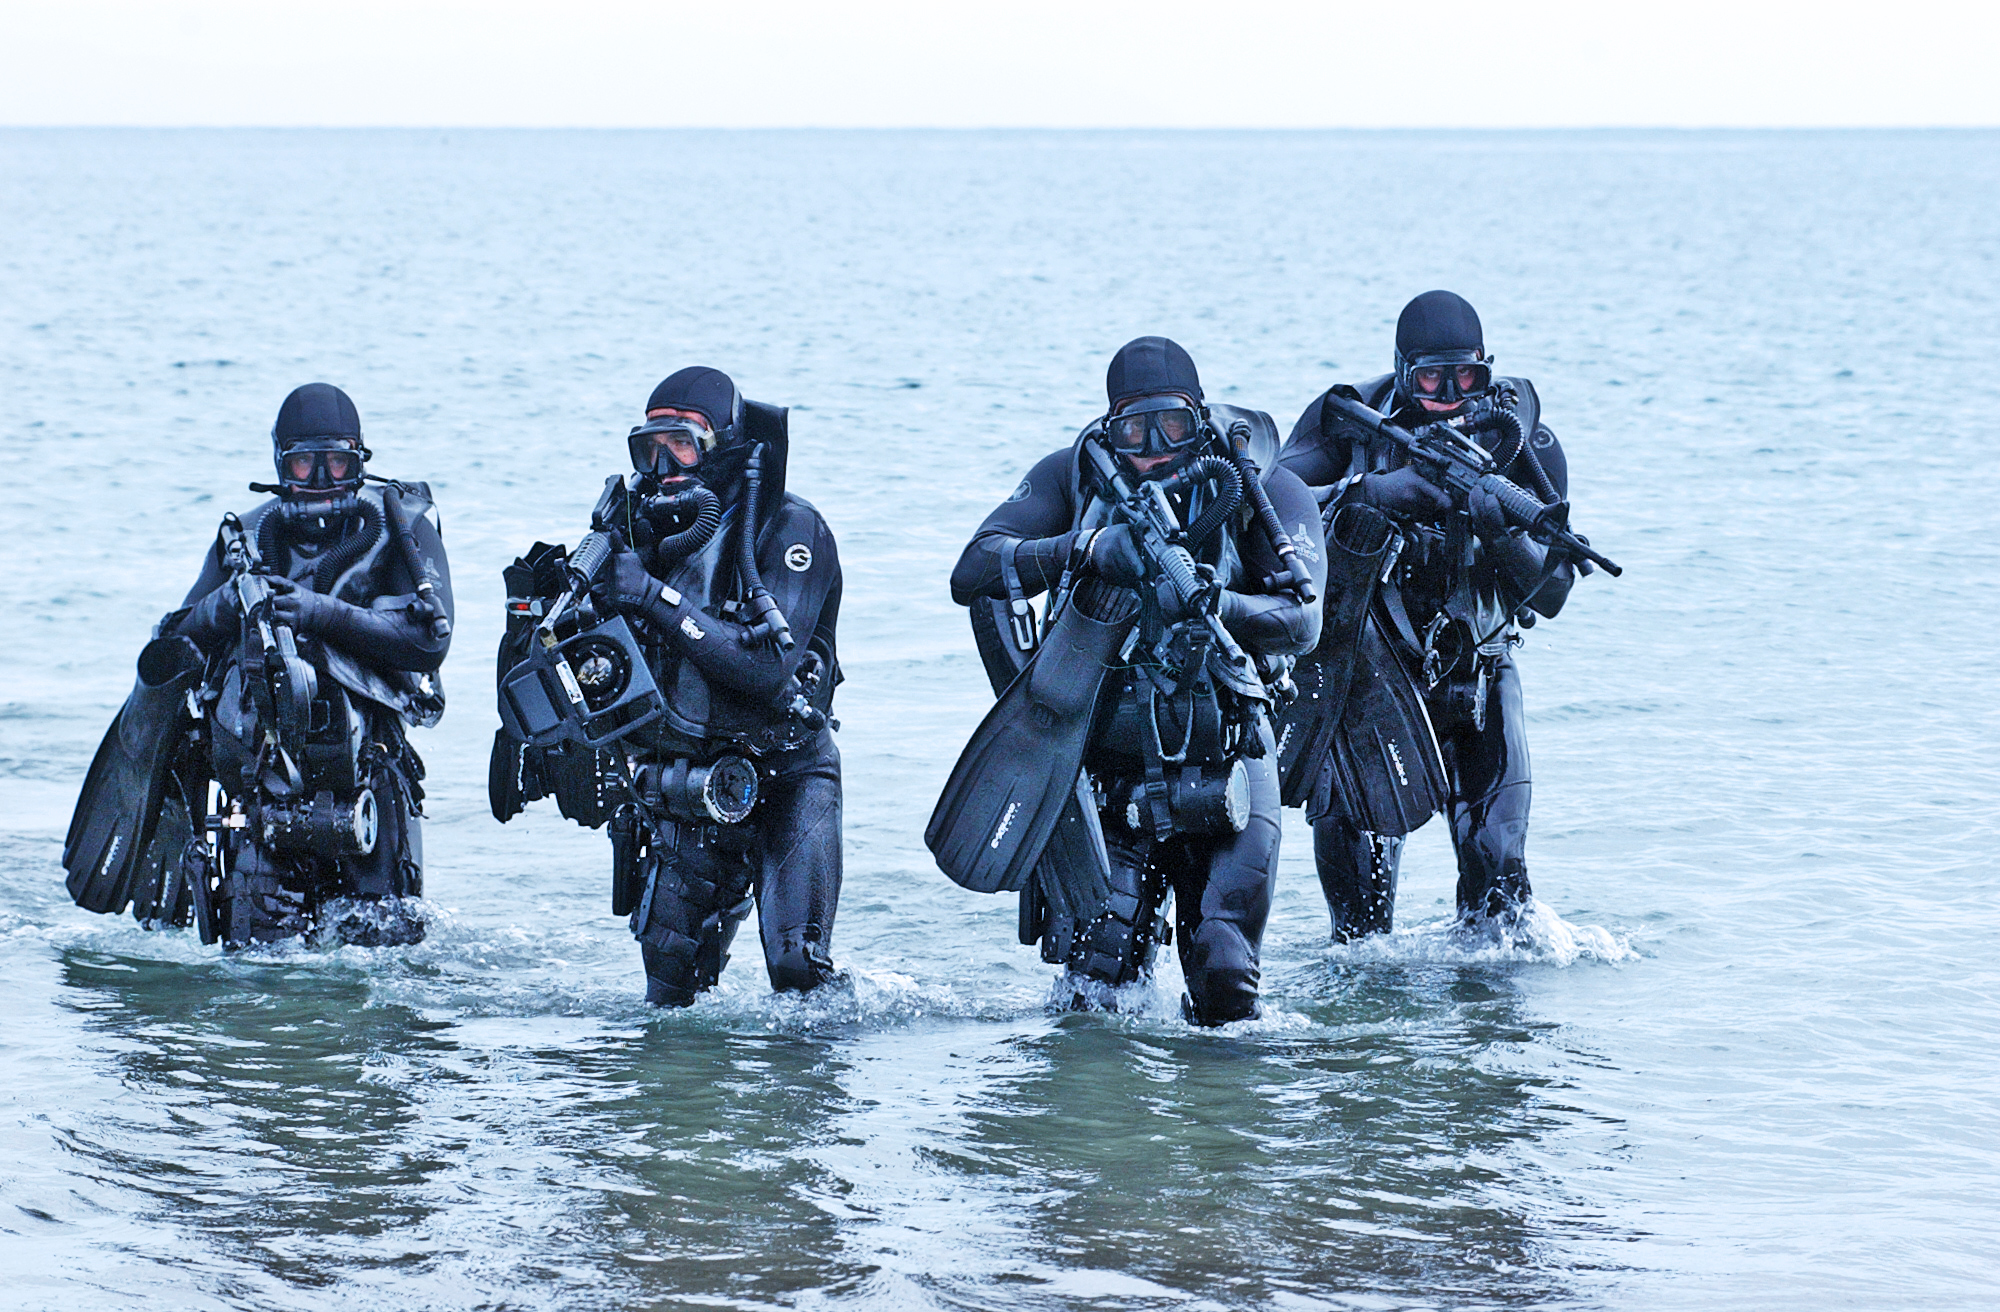 Molto File:United States Navy SEALs 525.jpg - Wikimedia Commons XU96